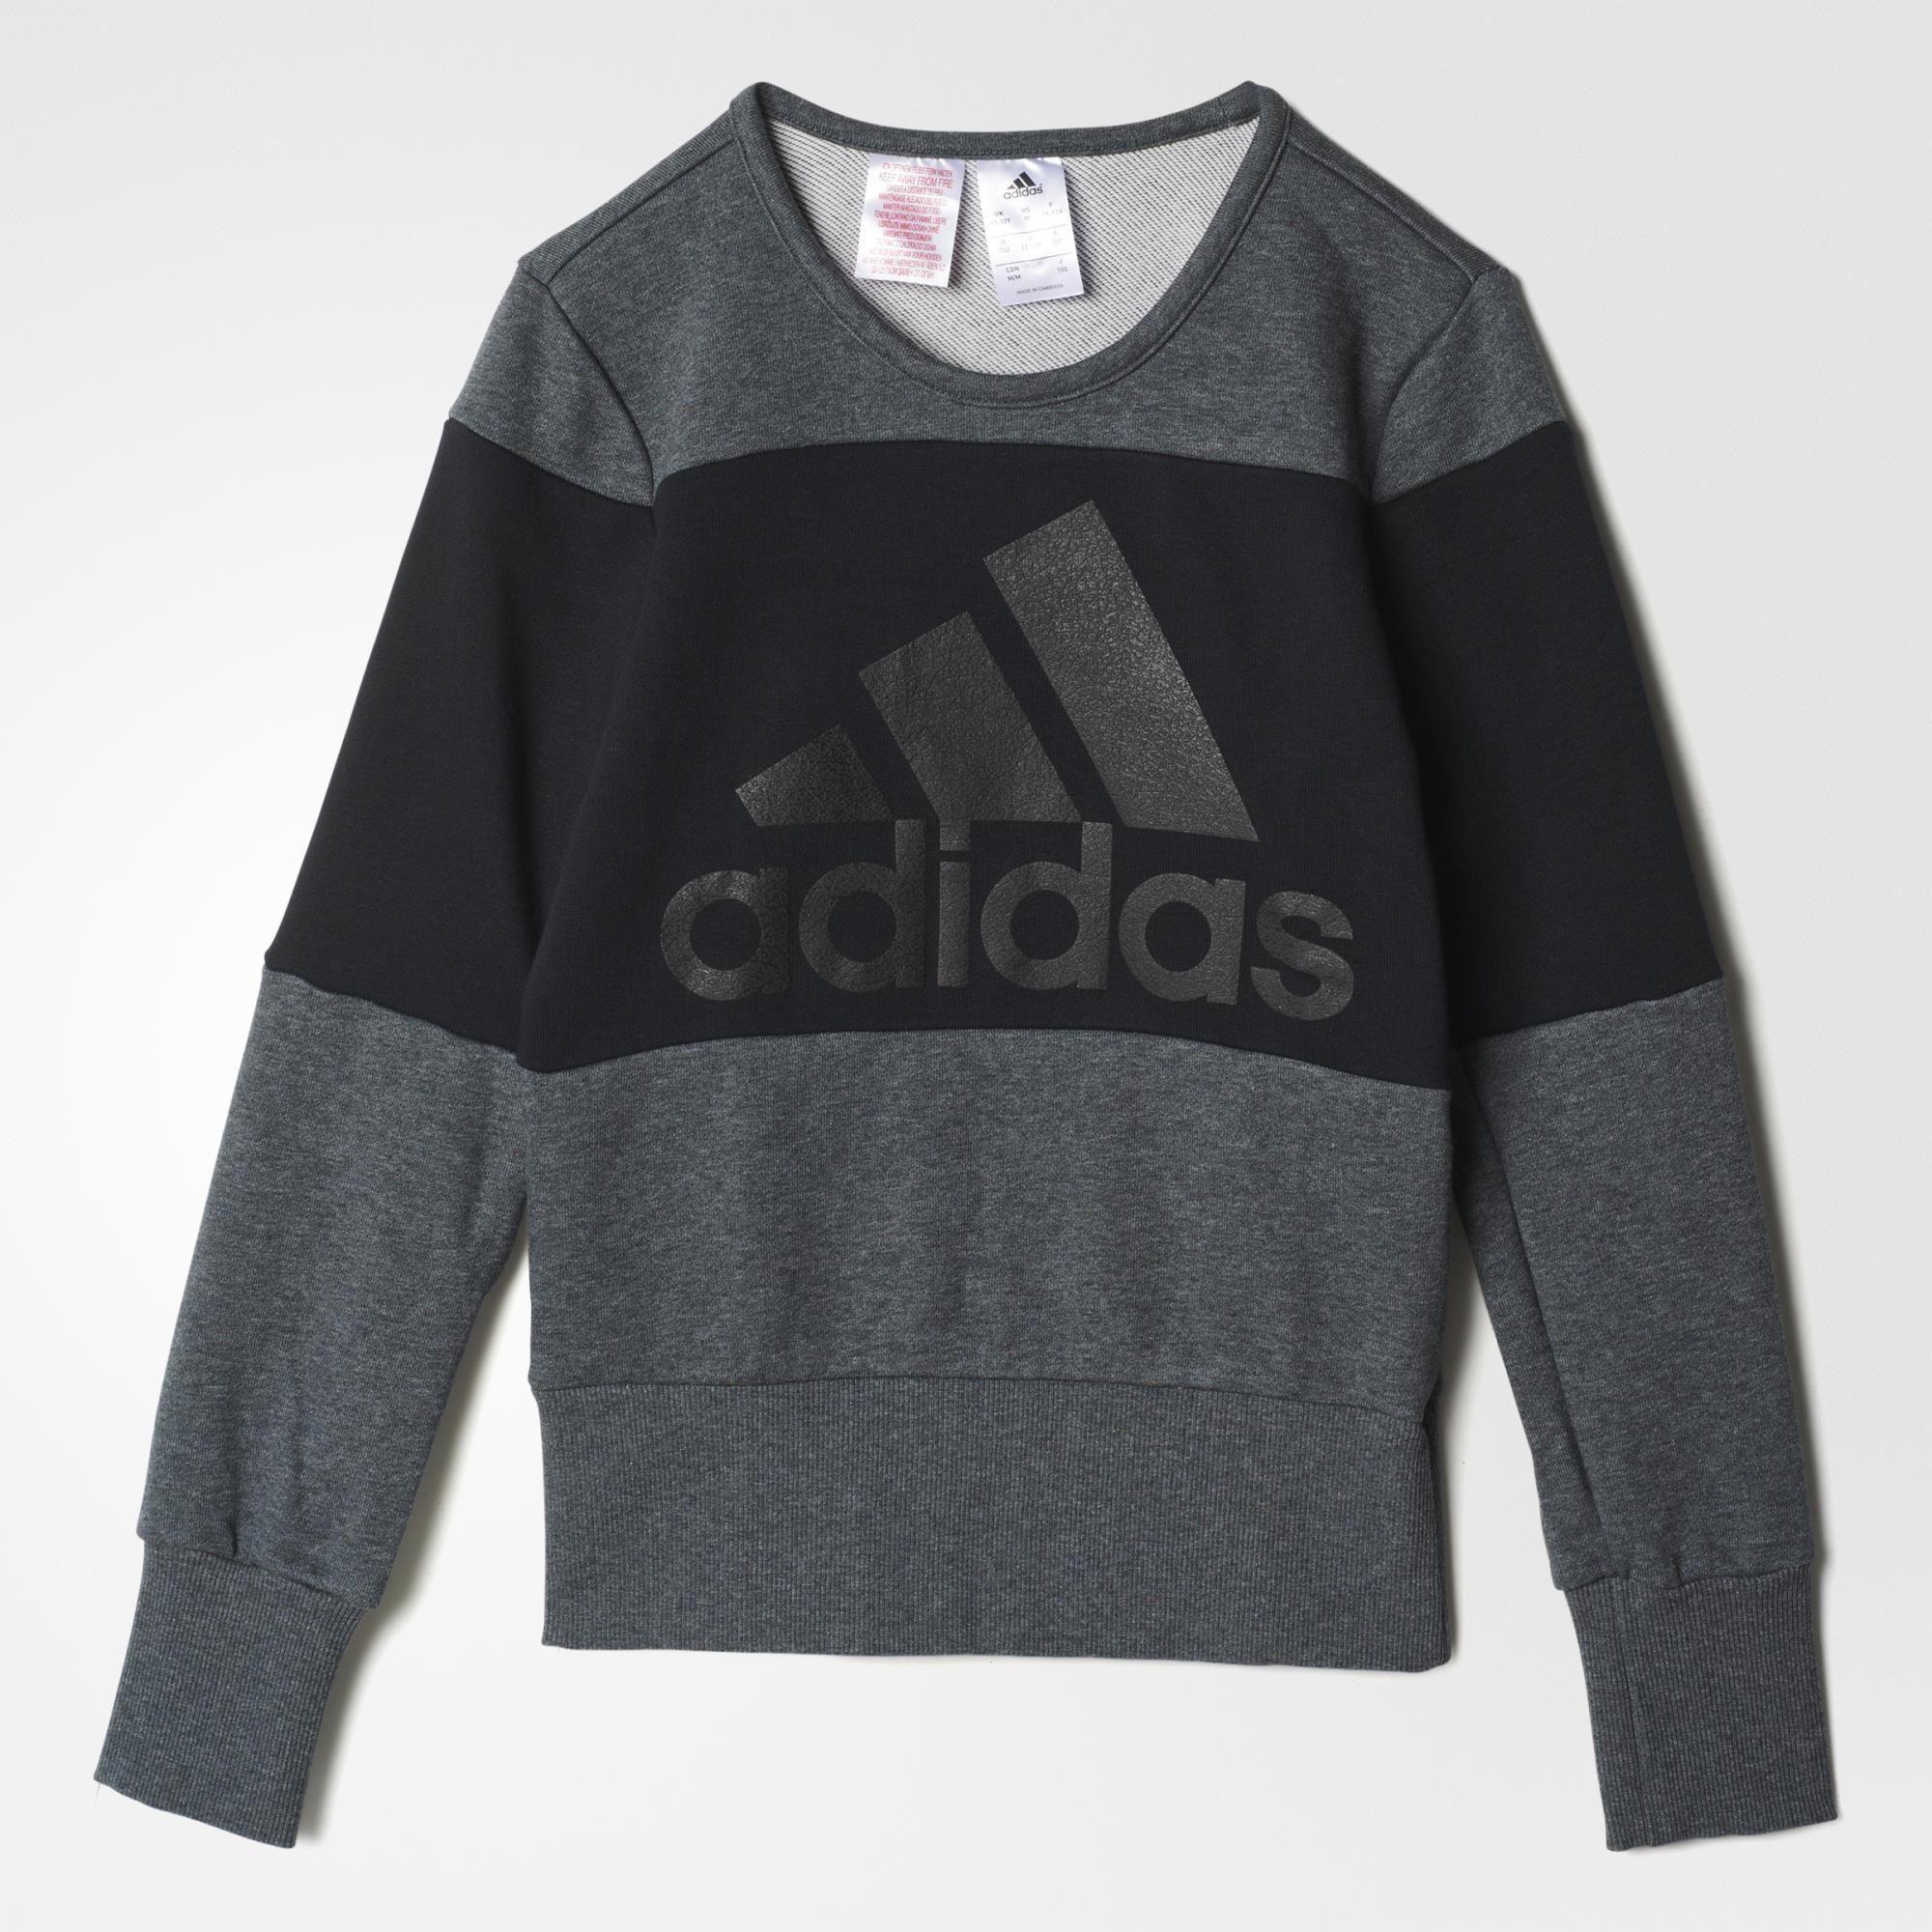 Mädchen Sweatshirt Wardrobe Style